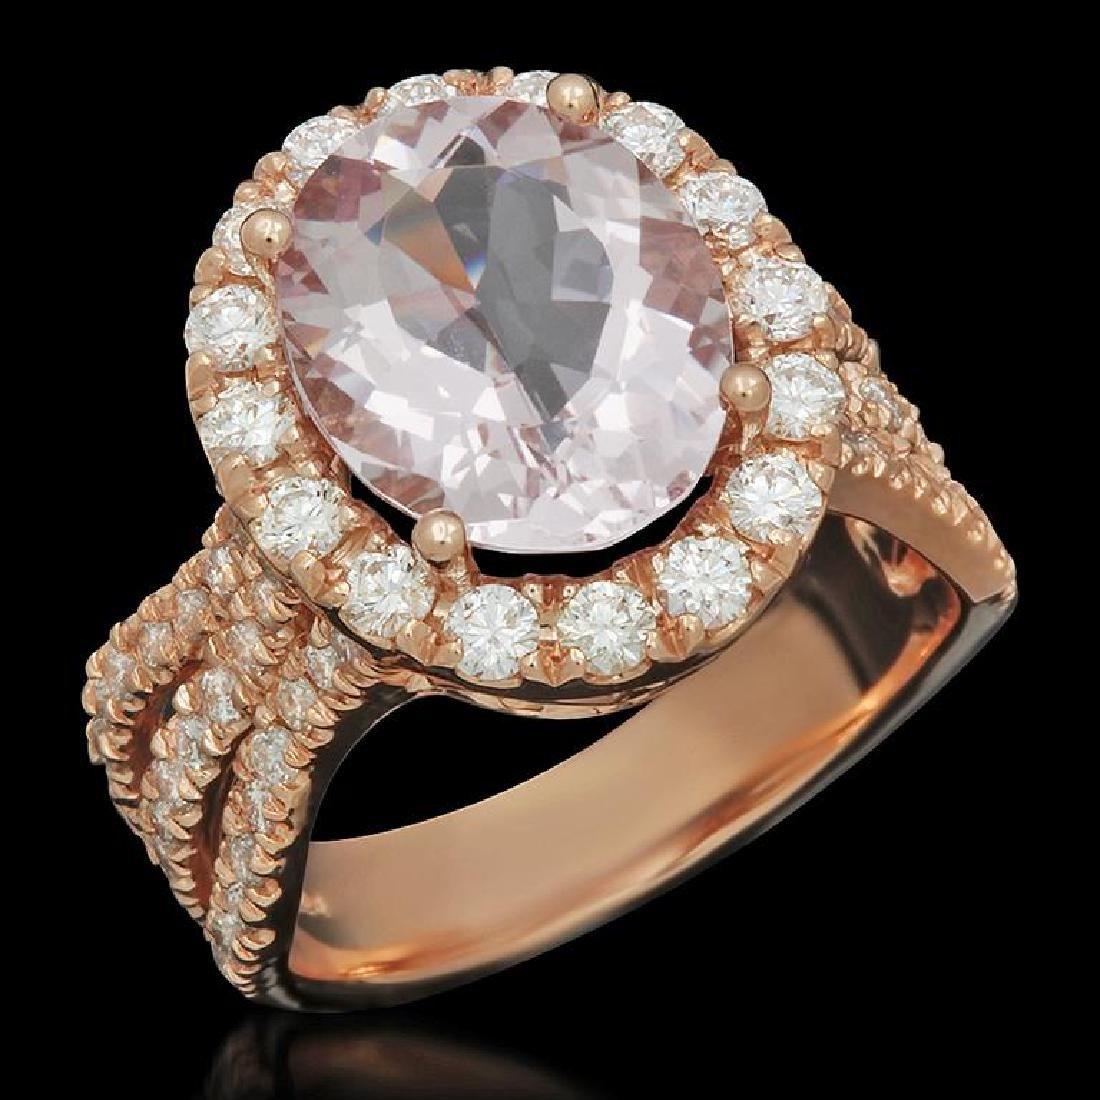 14K Gold 8.3ct Morganite 1.40ct Diamond Ring